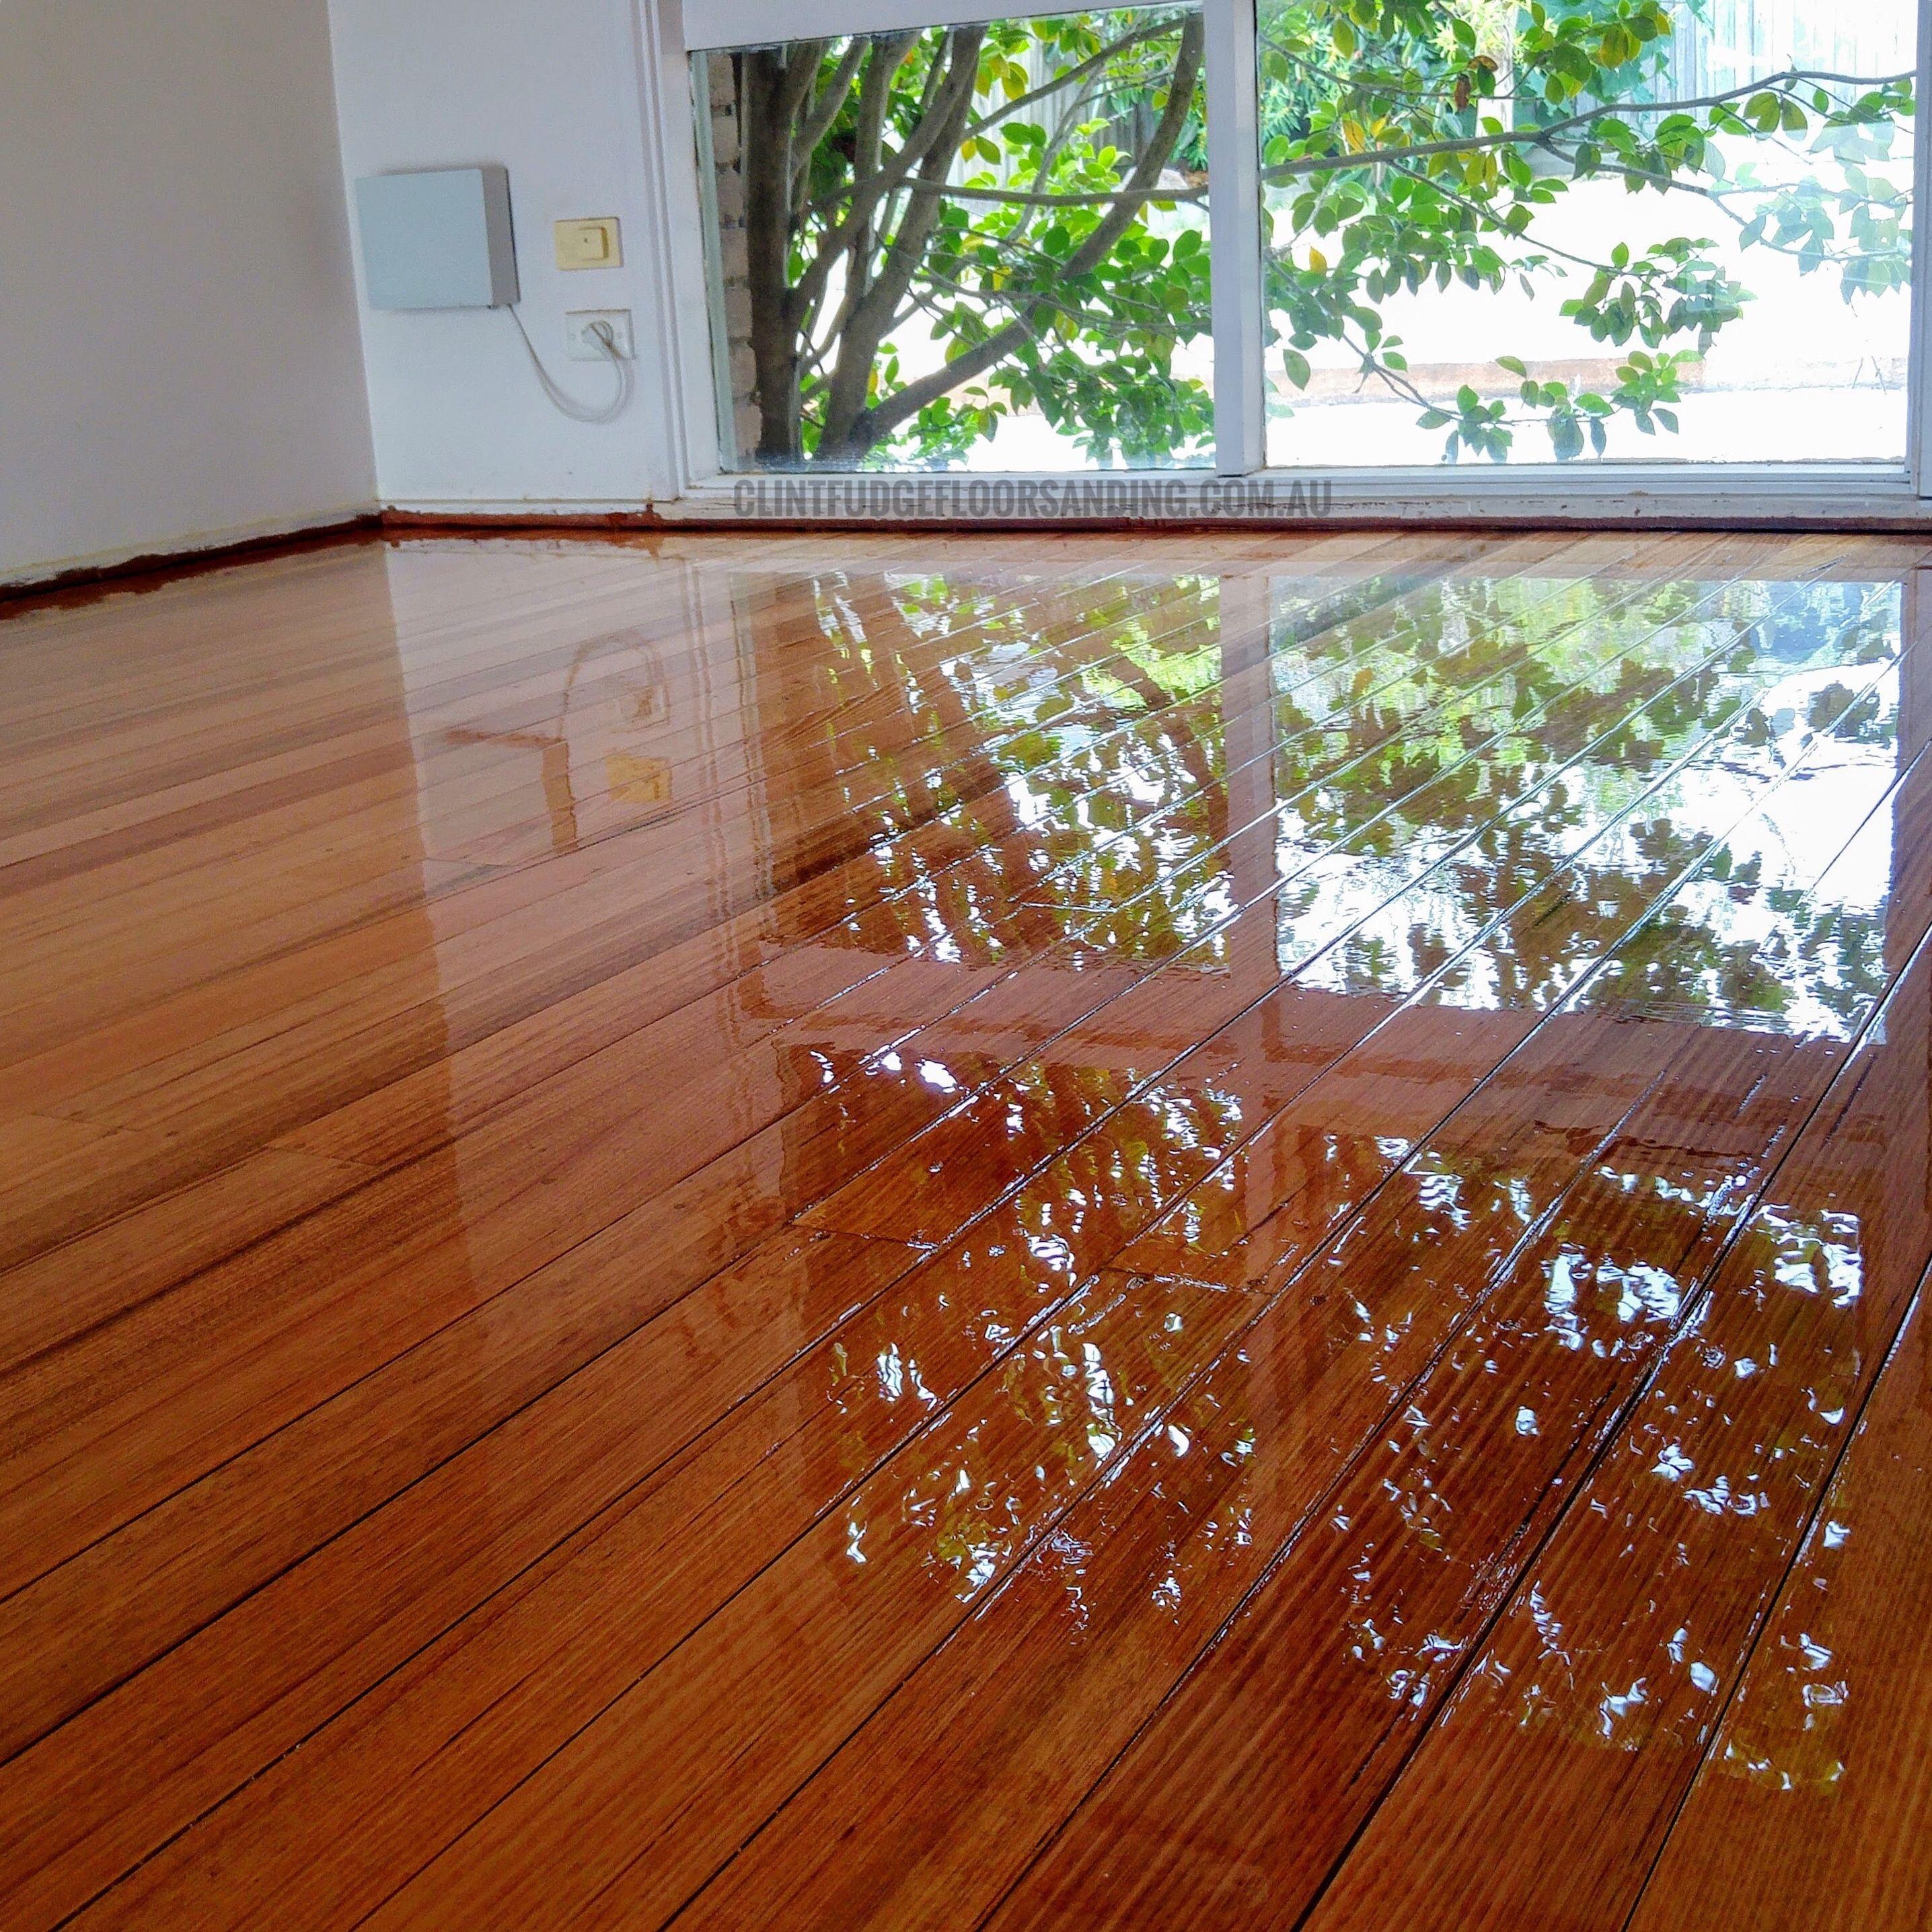 Tasmanian Oak Finished In The Finest High Gloss Polyurethane Fudgeflat Assoalho De Madeira Casa E Lar Porcelanato